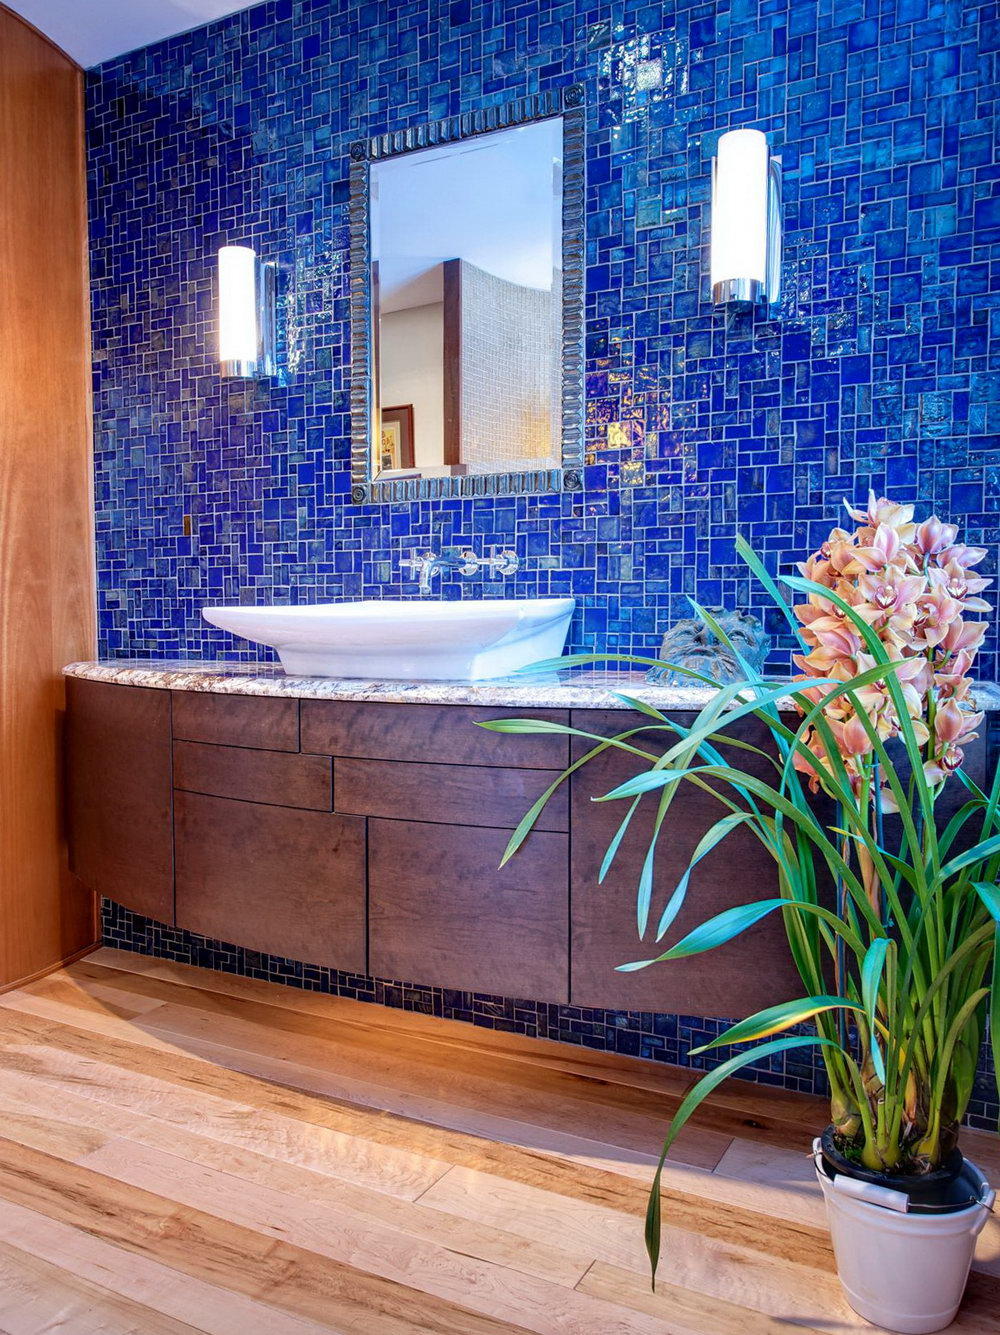 Blue Cobalt Tiles for the Walls